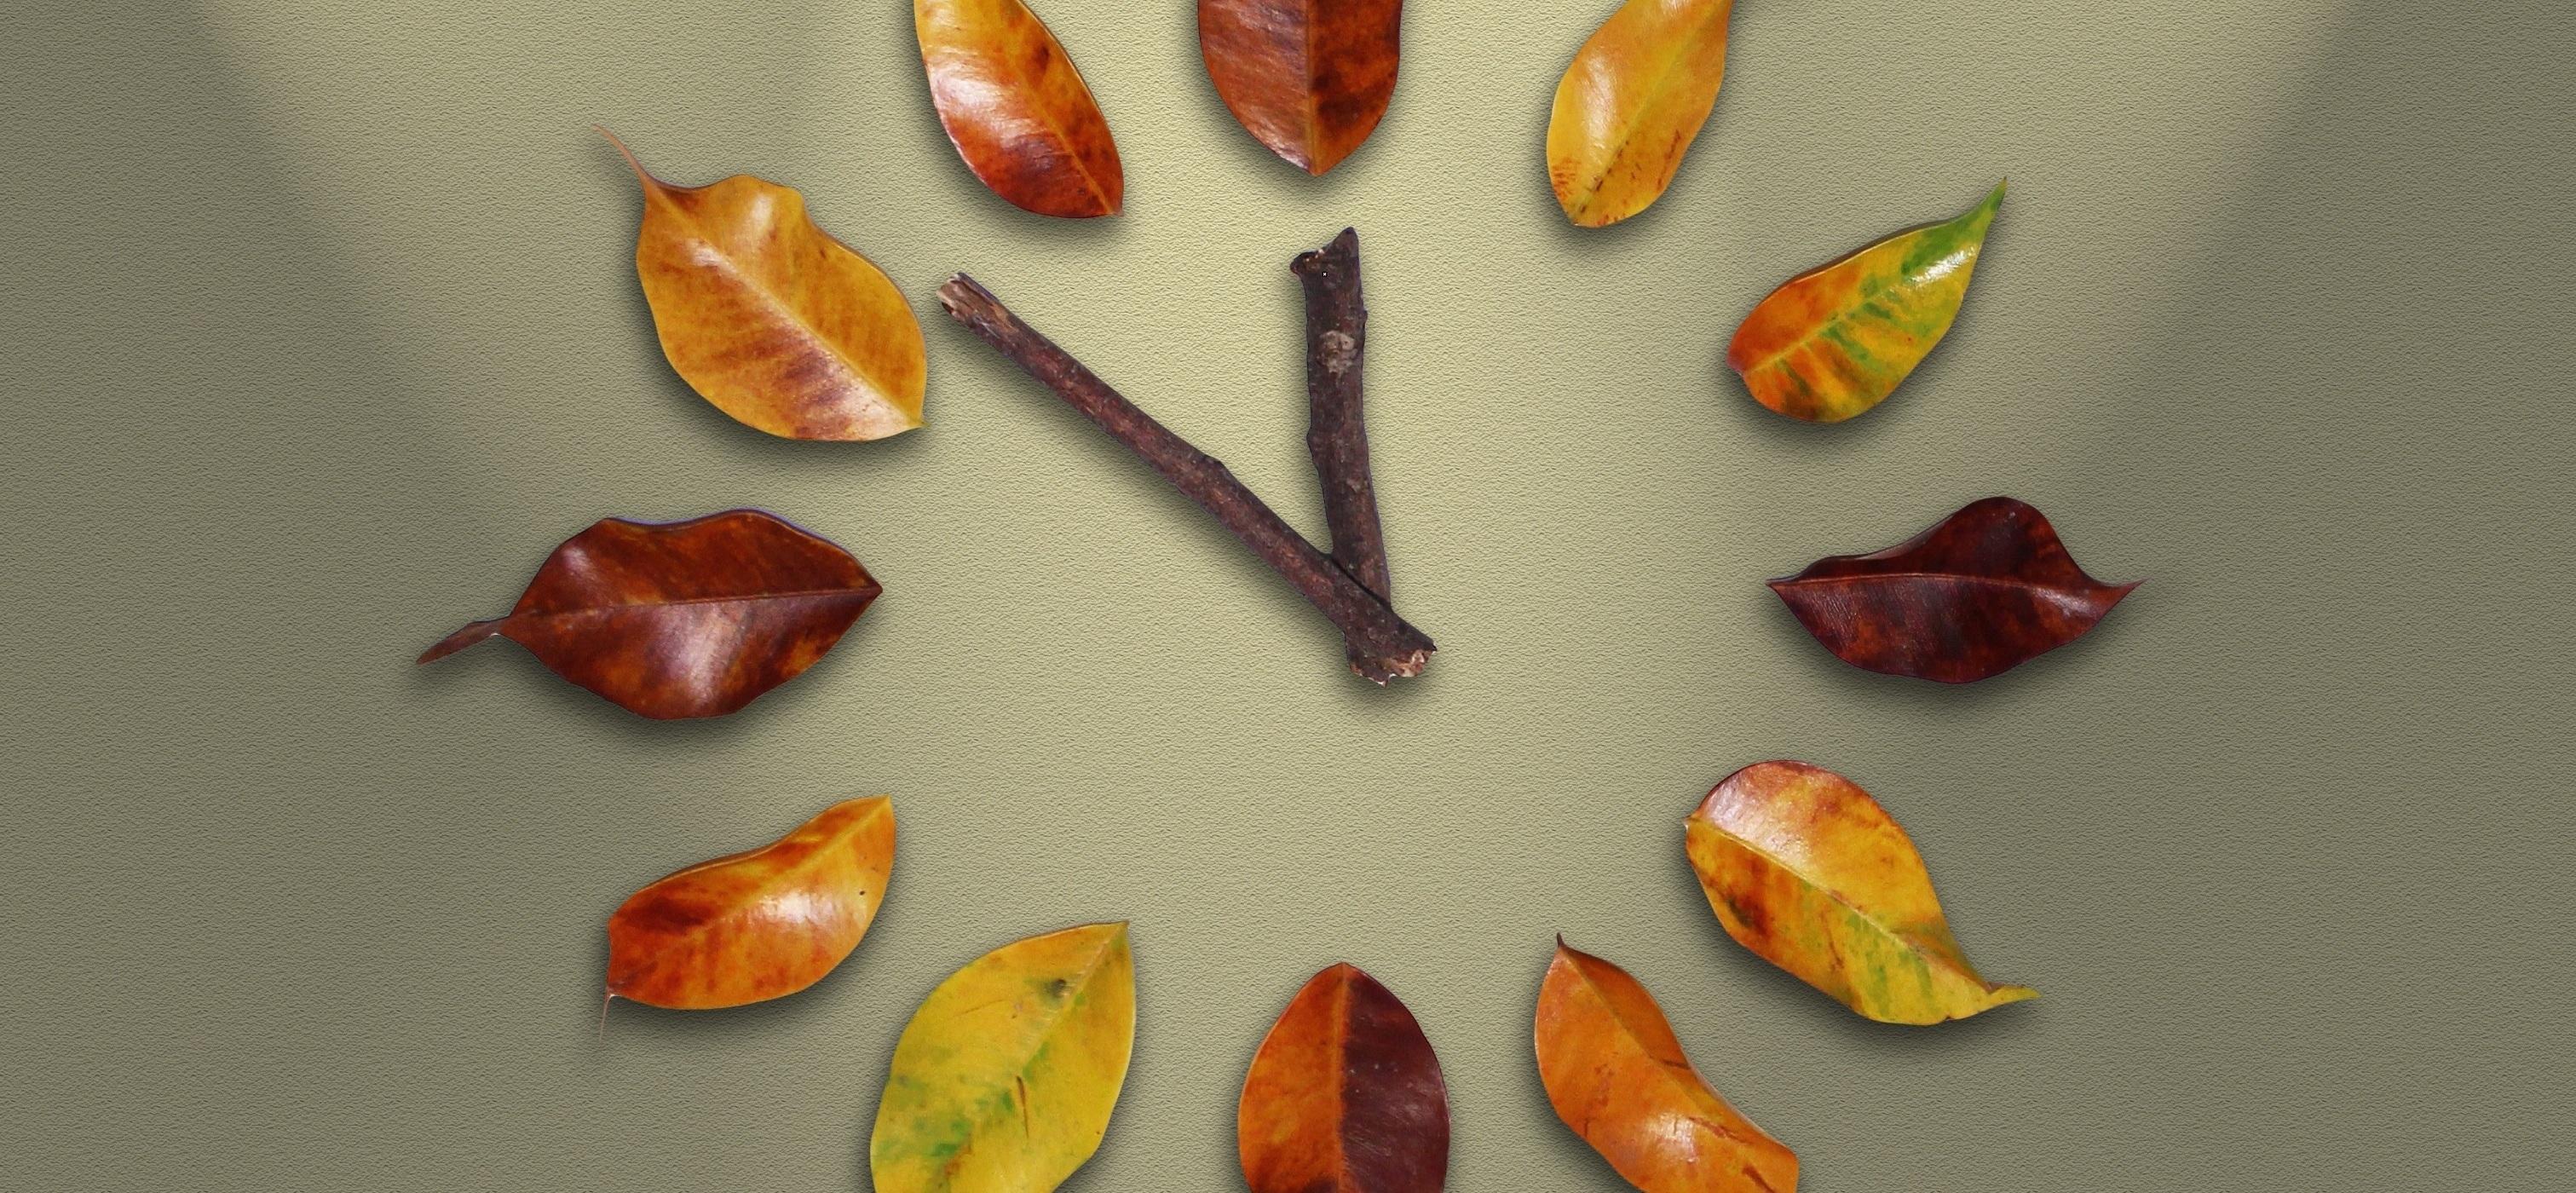 watch-1893395-feuilles